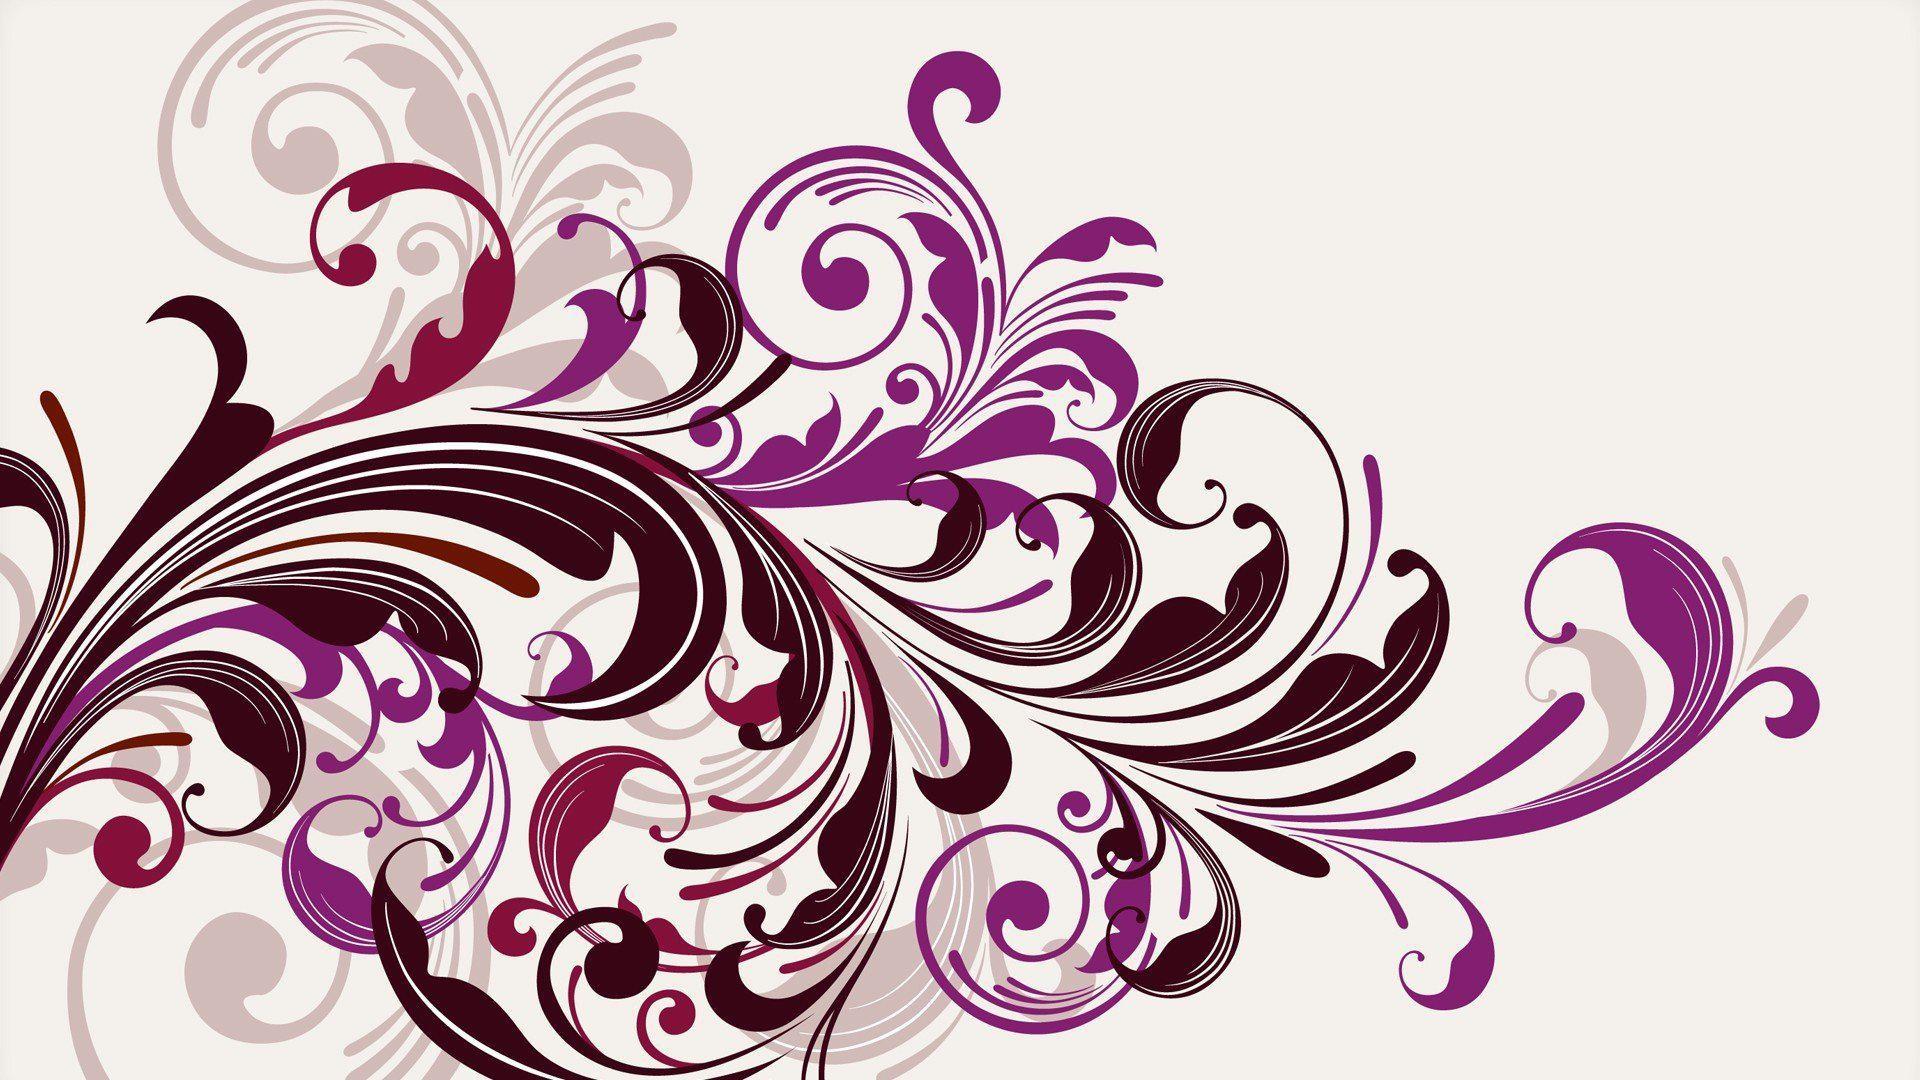 HD Purple Vectors Swirls Floral Graphics White Background Free Wallpaper